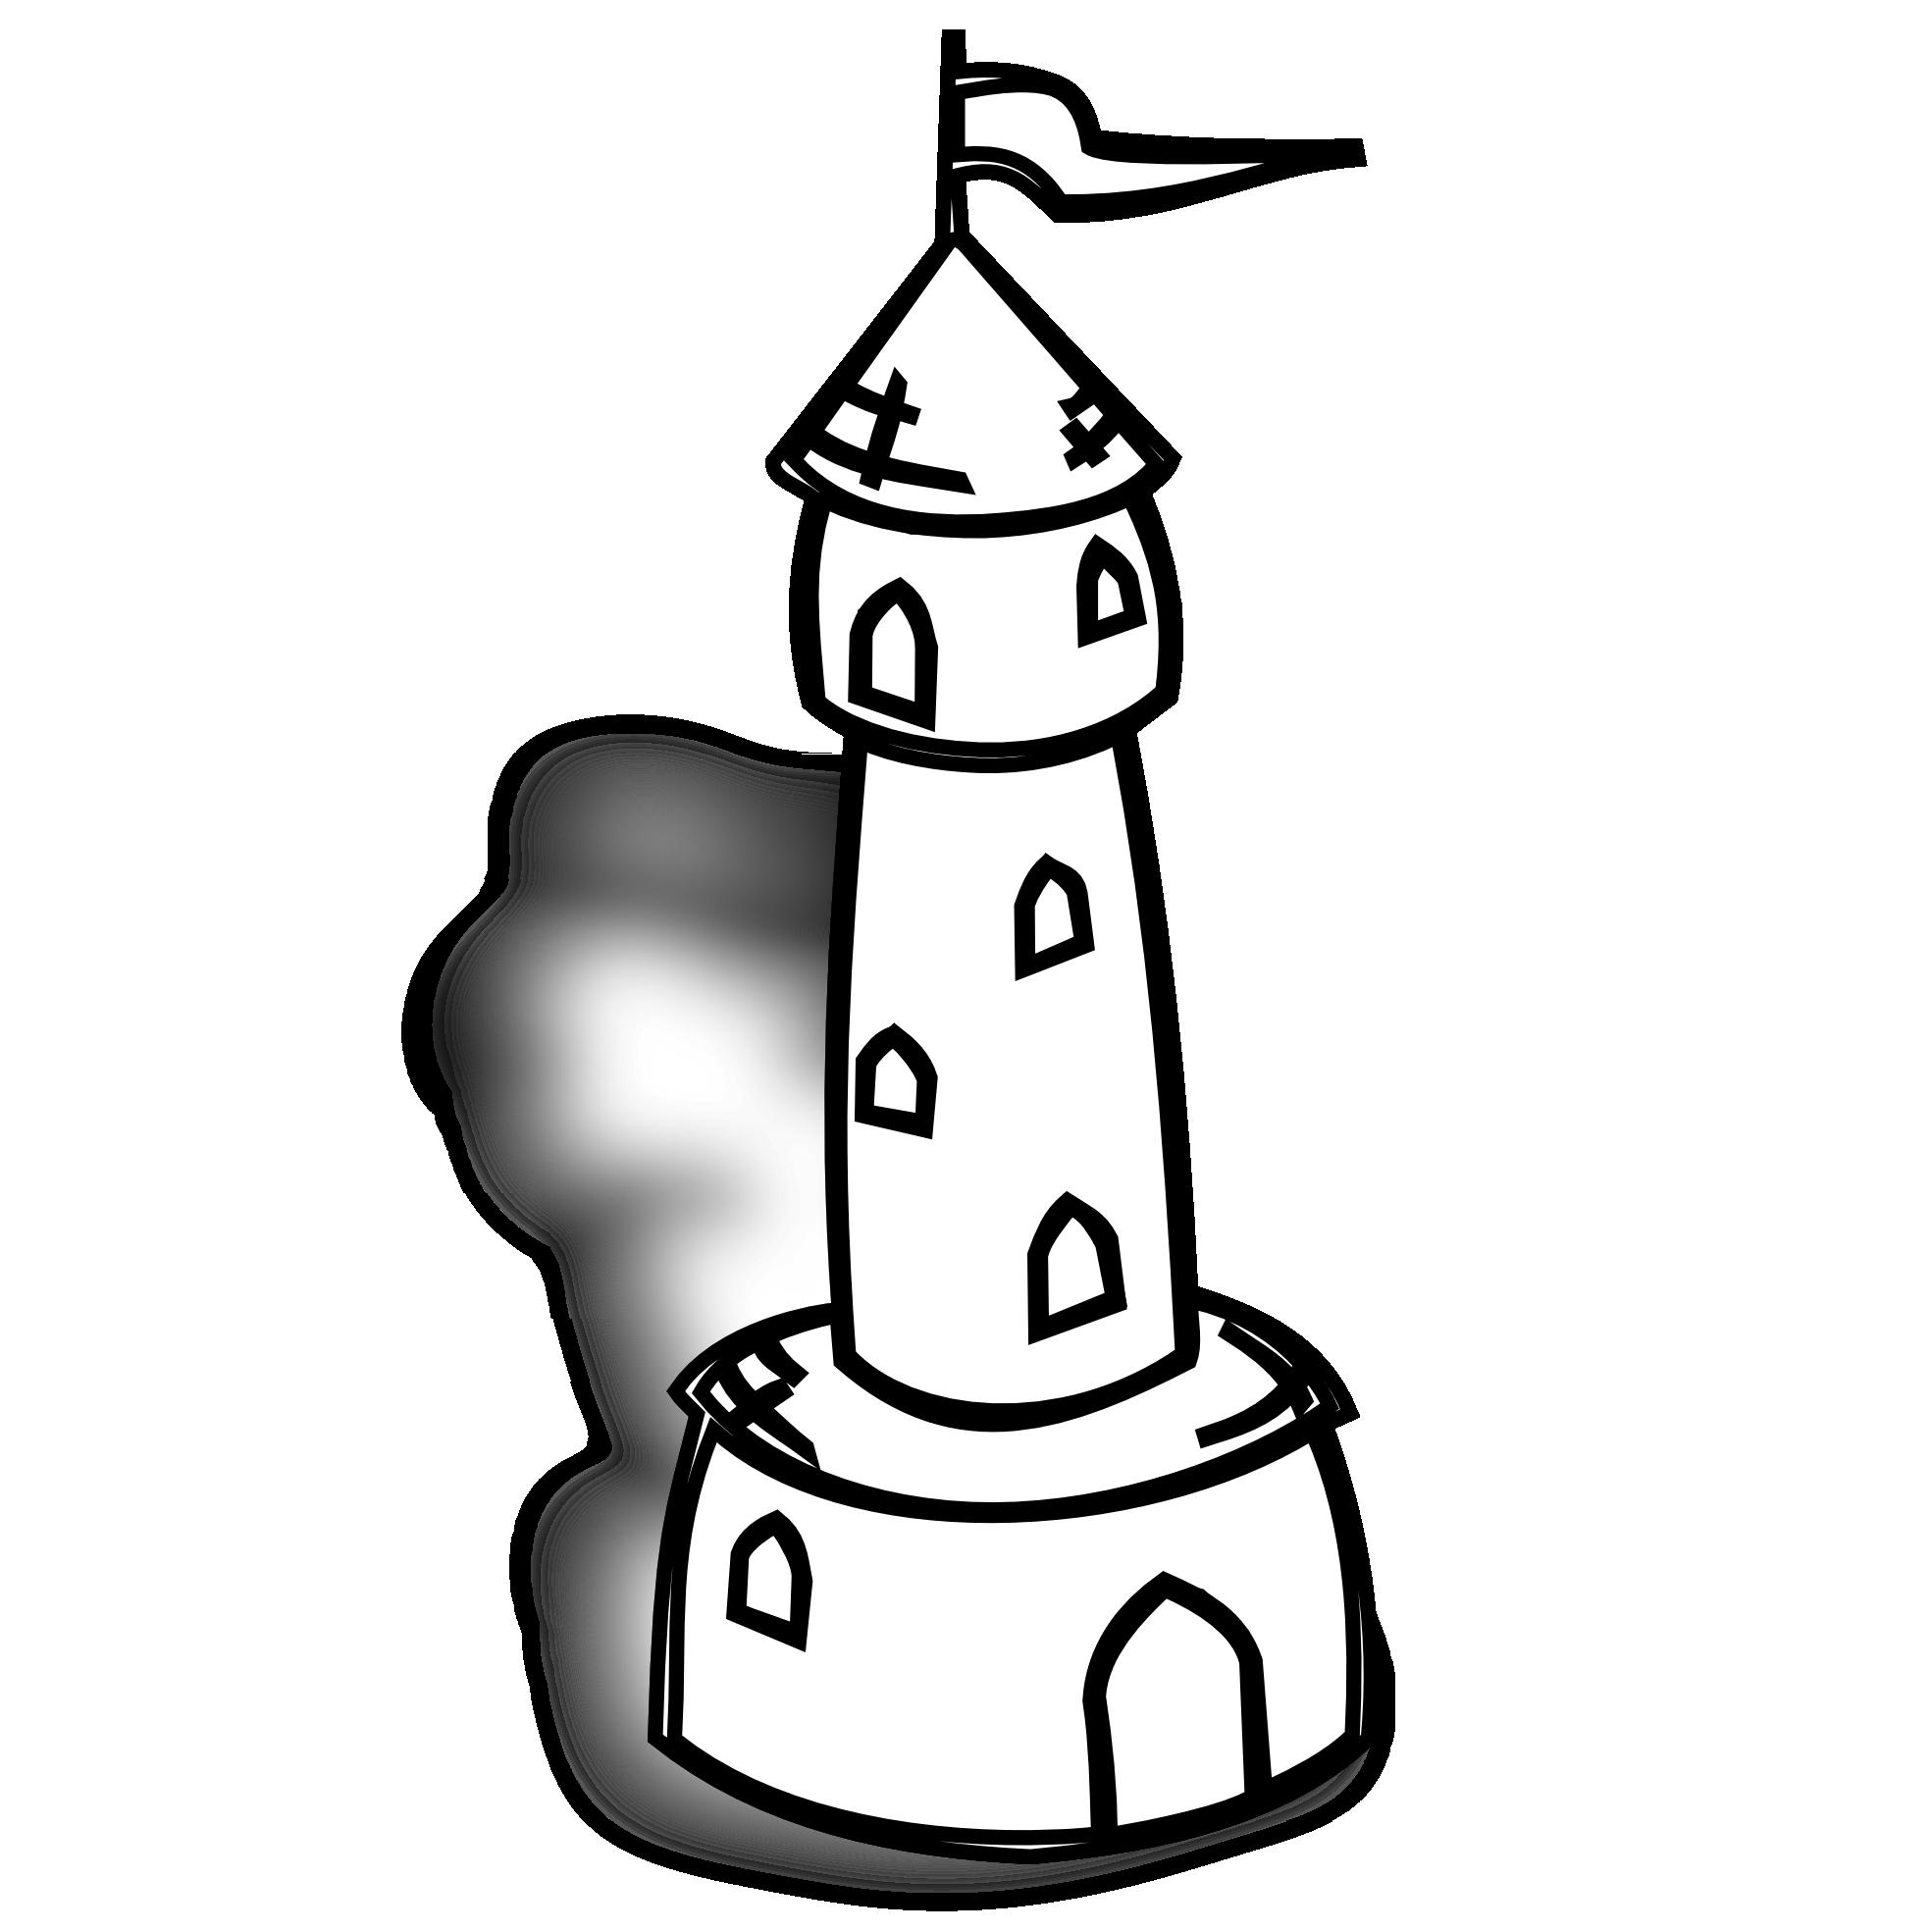 Neighborhood clip art black. Tower clipart watchman